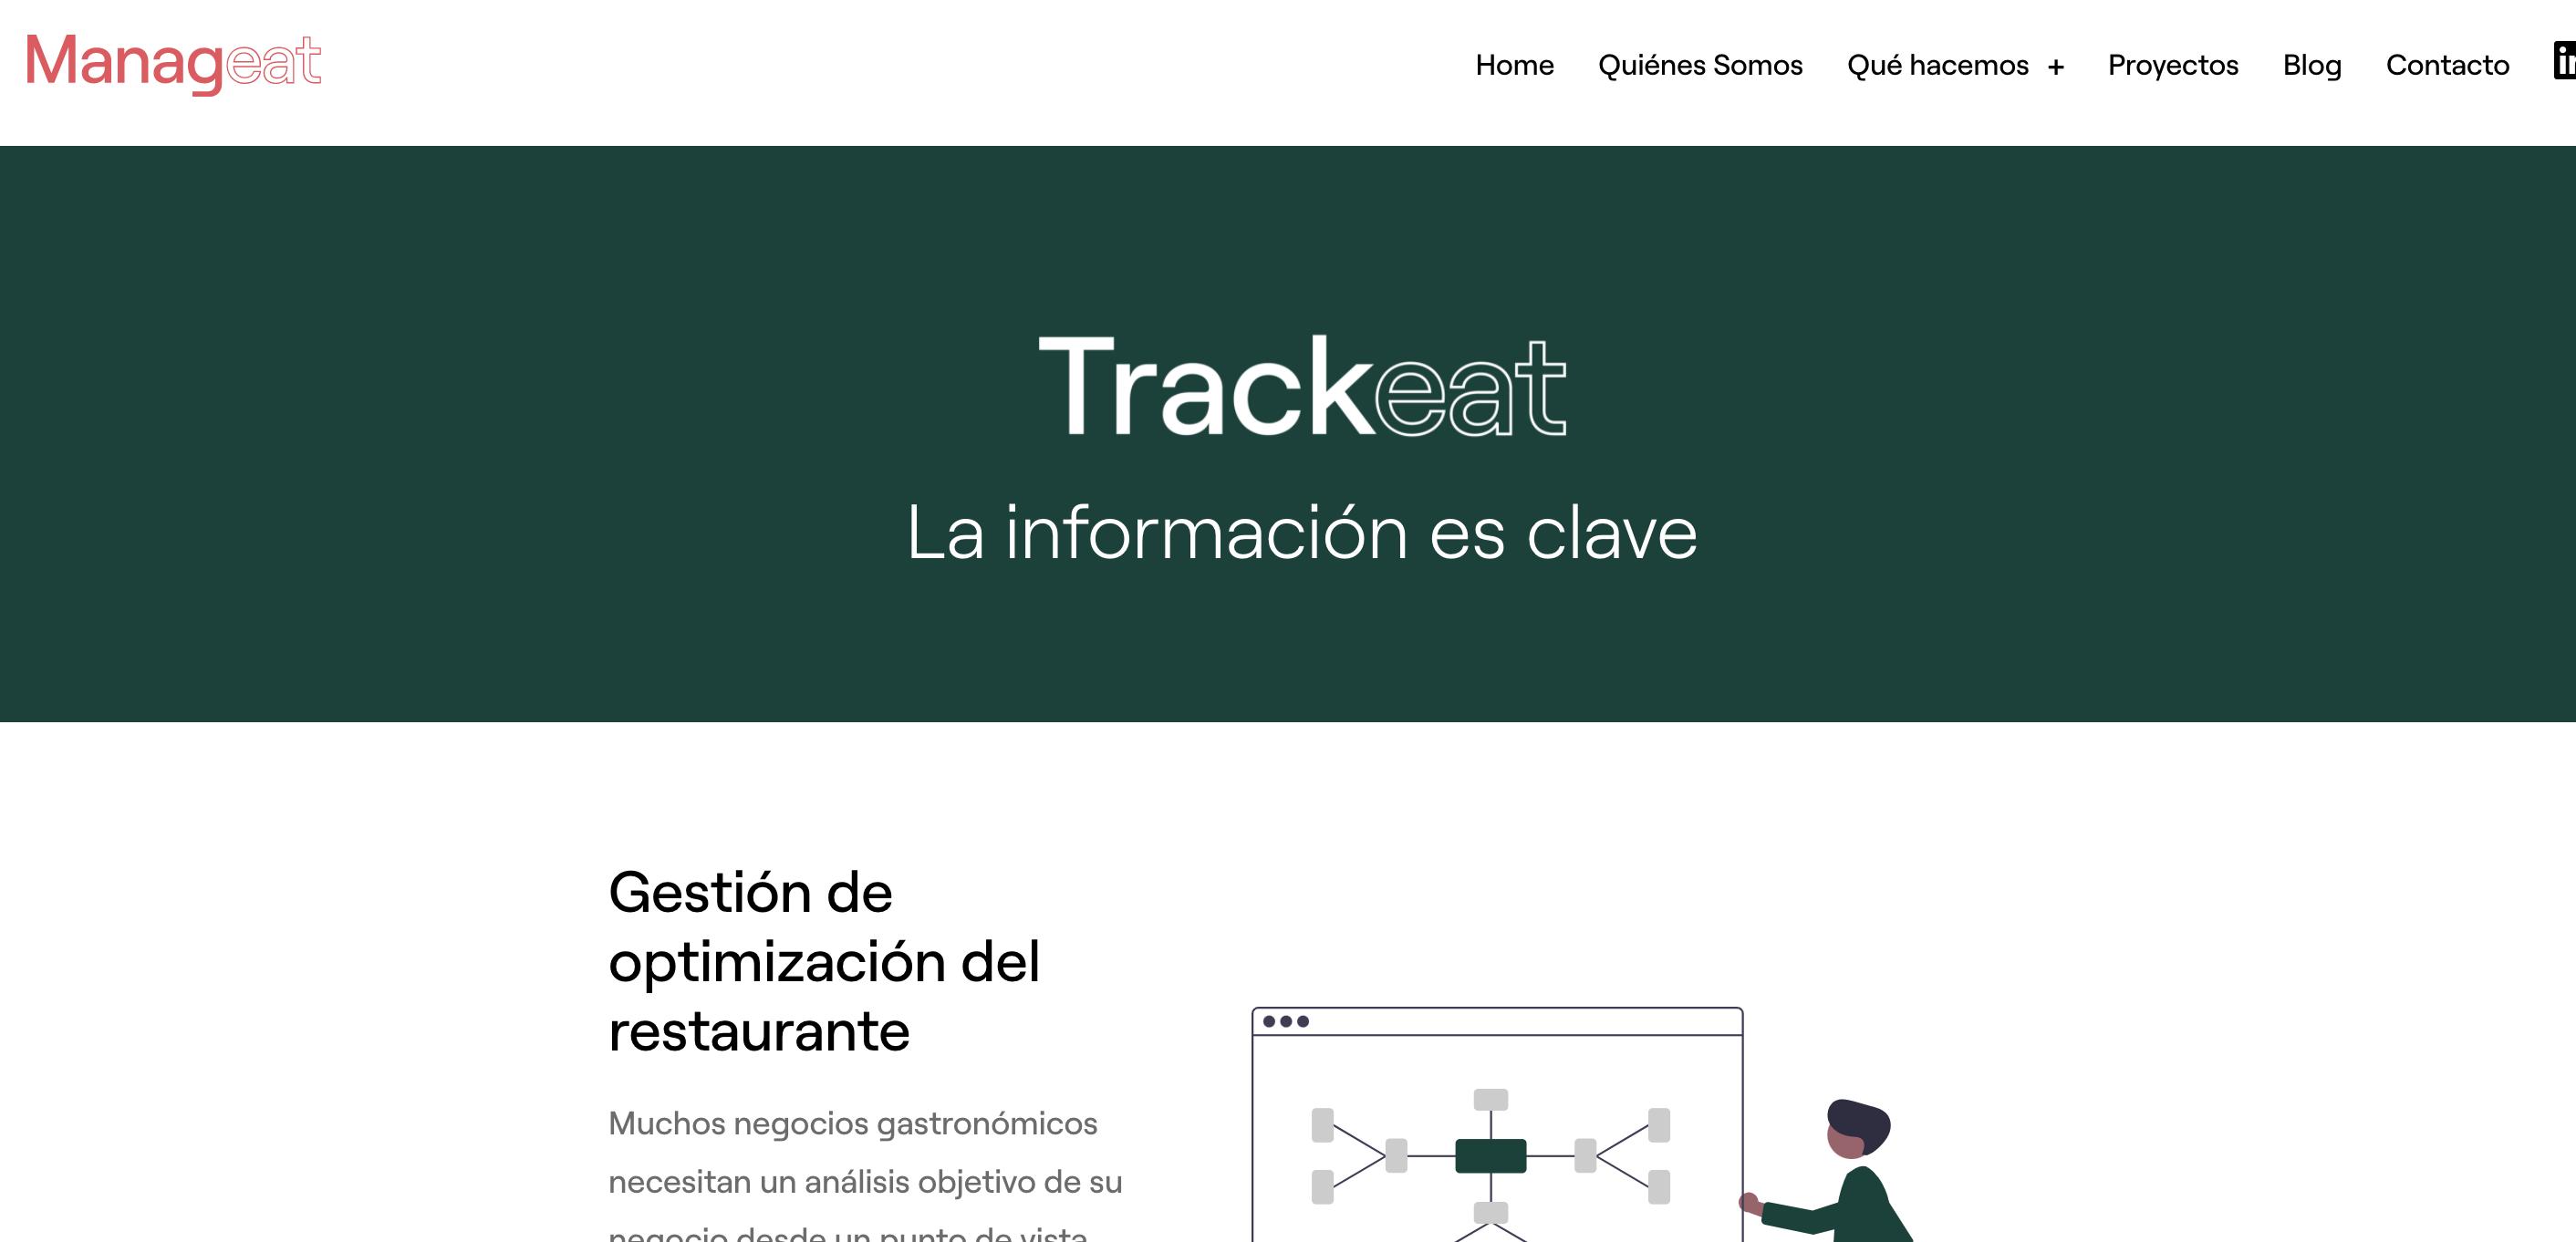 Trackeat Manageat